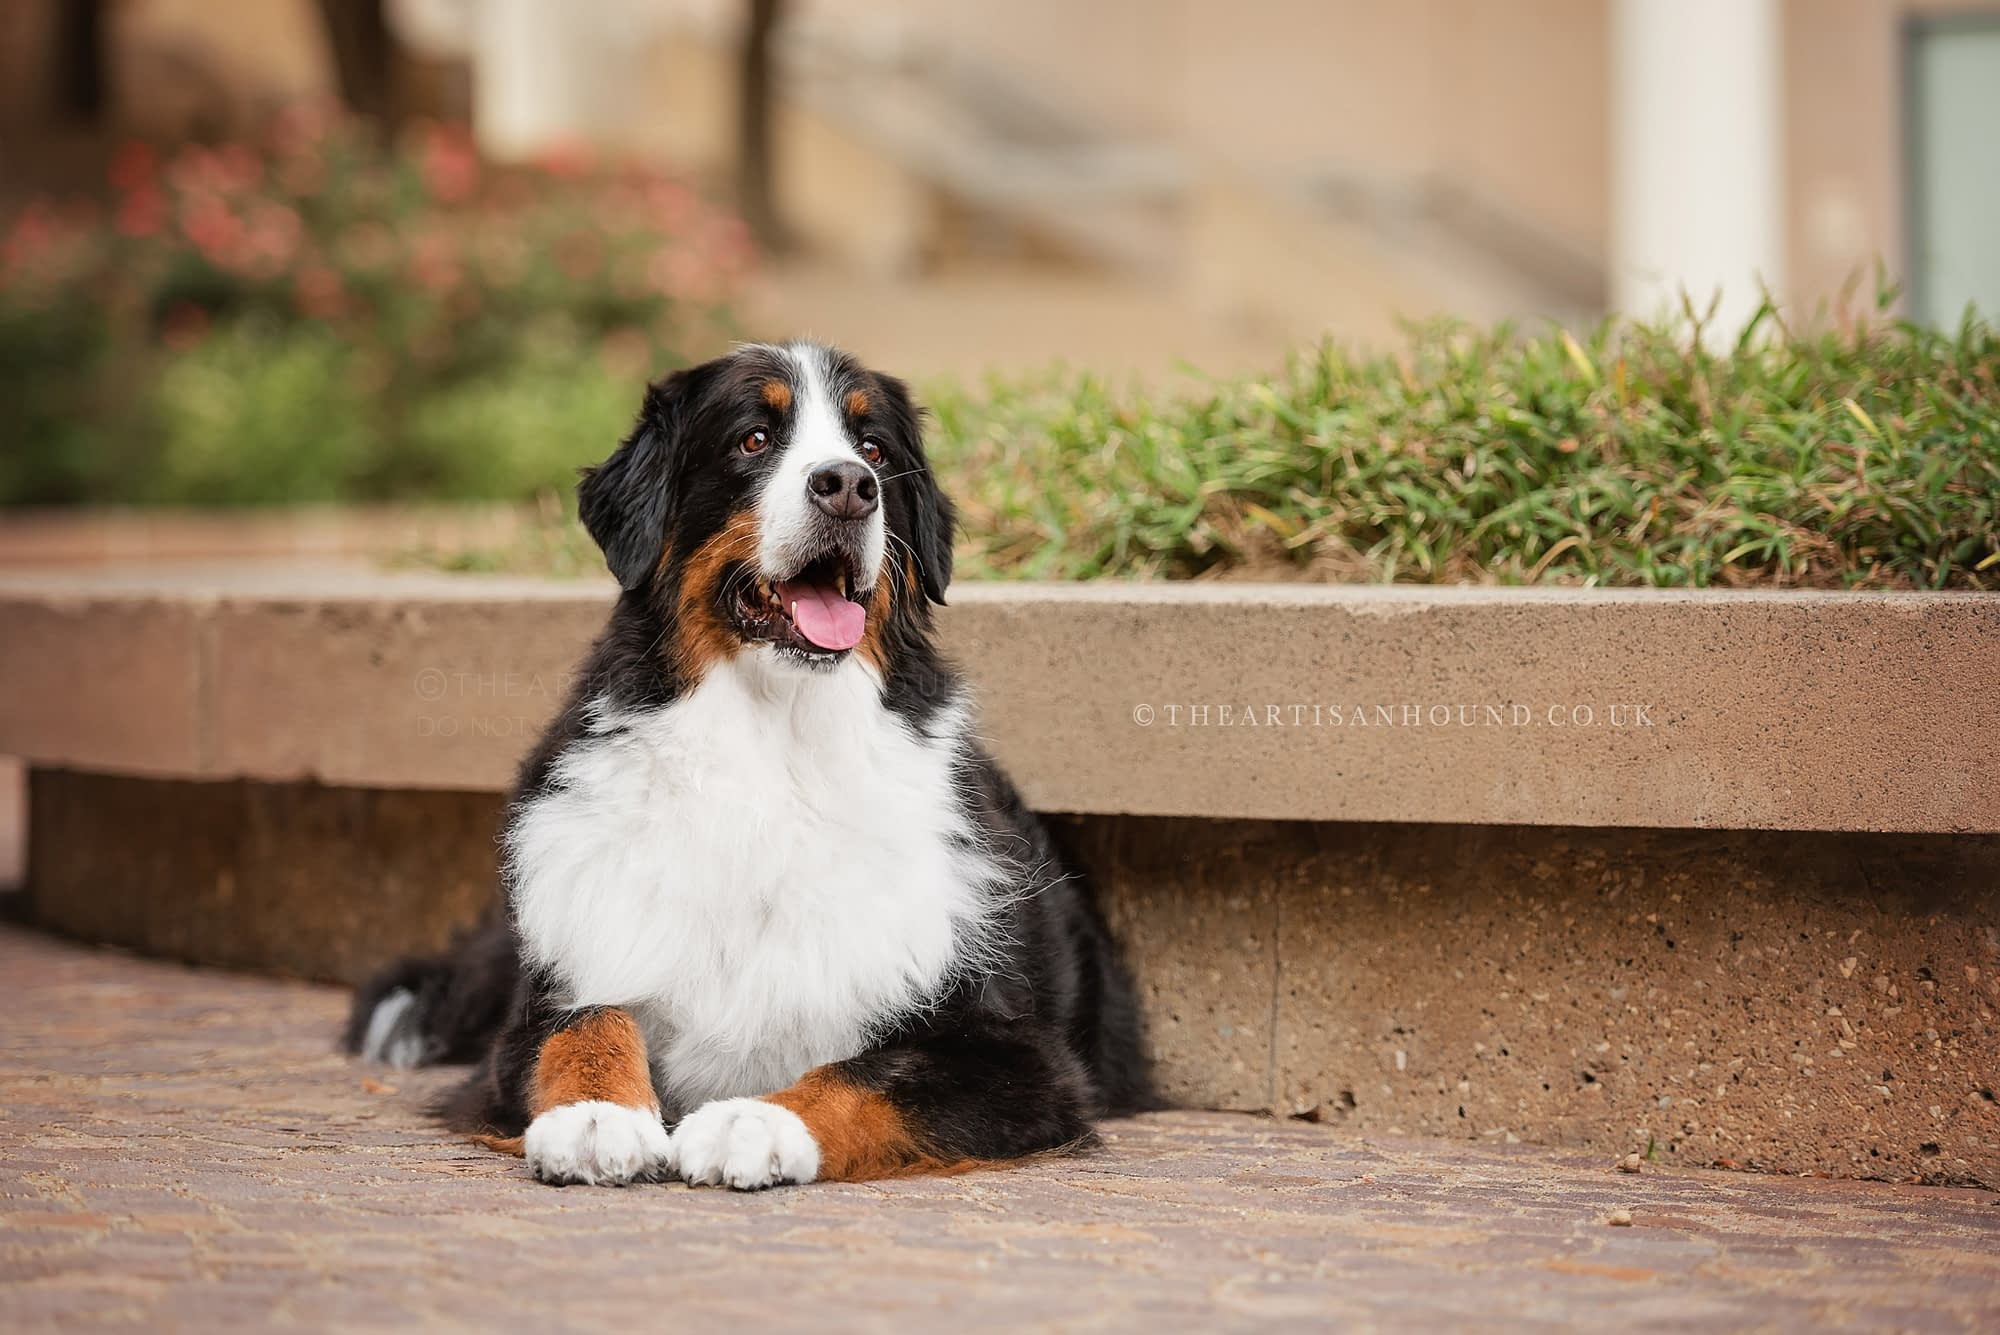 Dog portrait photographer Northamptonshire